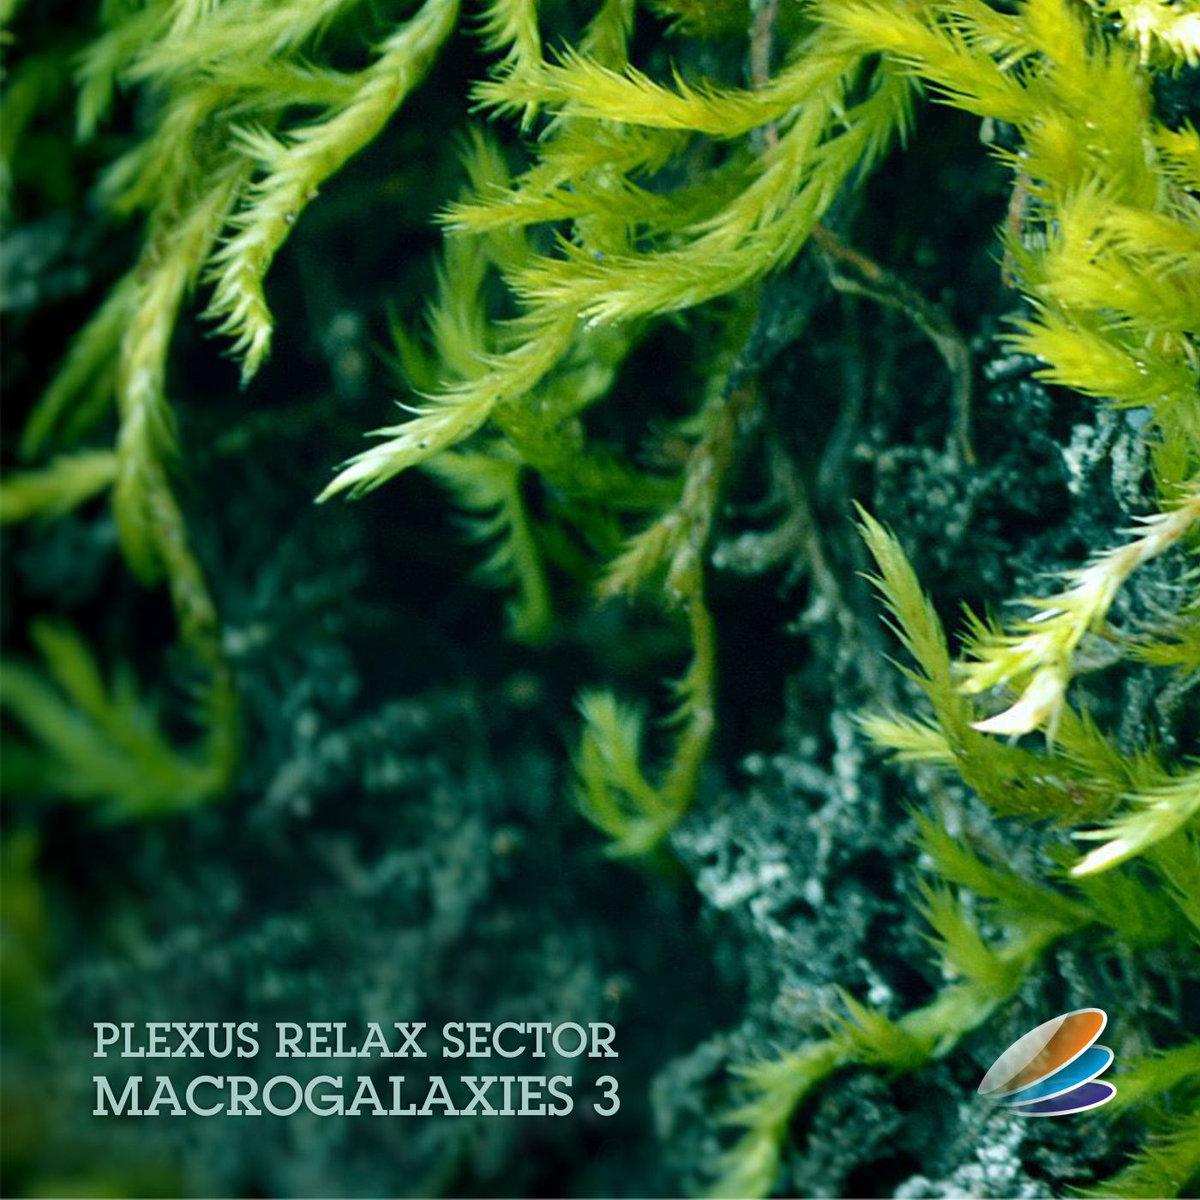 Plexus Relax Sector - Macrogalaxies 3